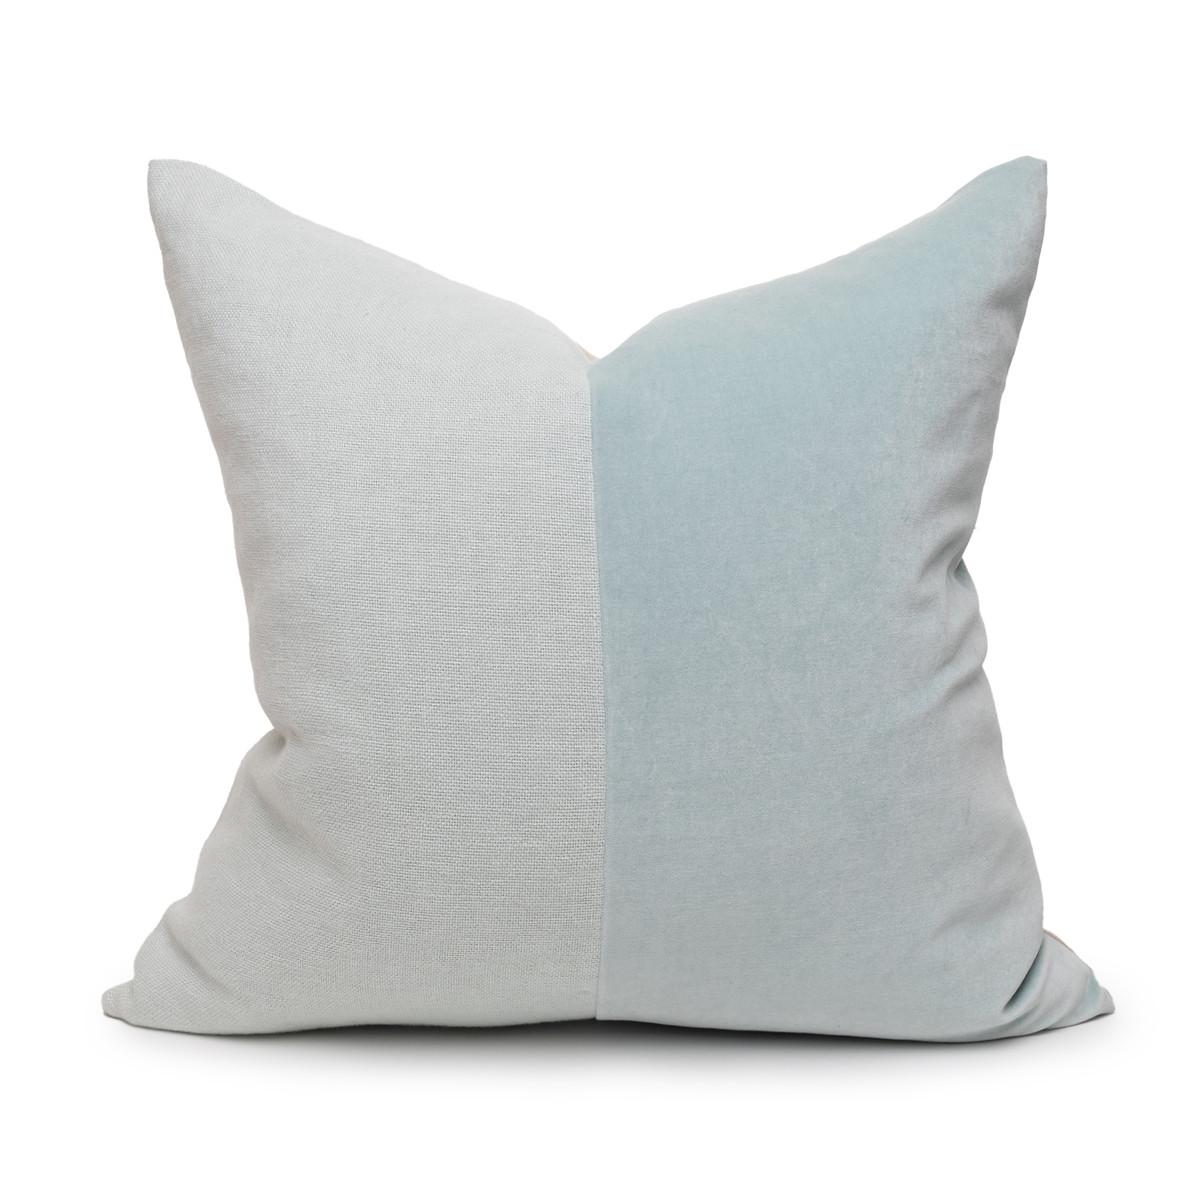 Saint Aqua Velvet Pillow - Front